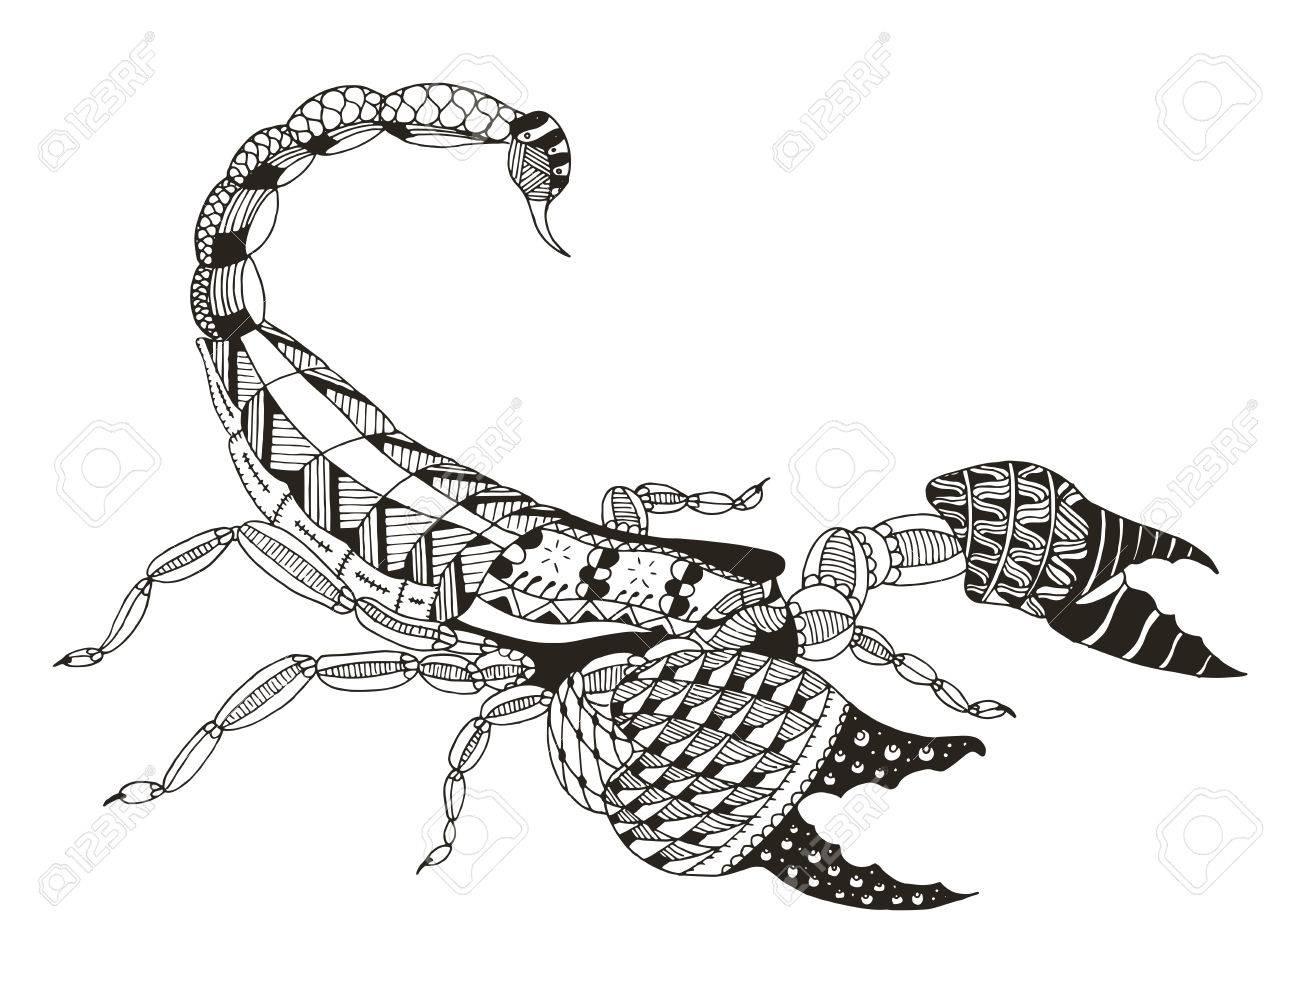 Skorpion Zentangle Stilisiert Vektor Illustration Freihändiger